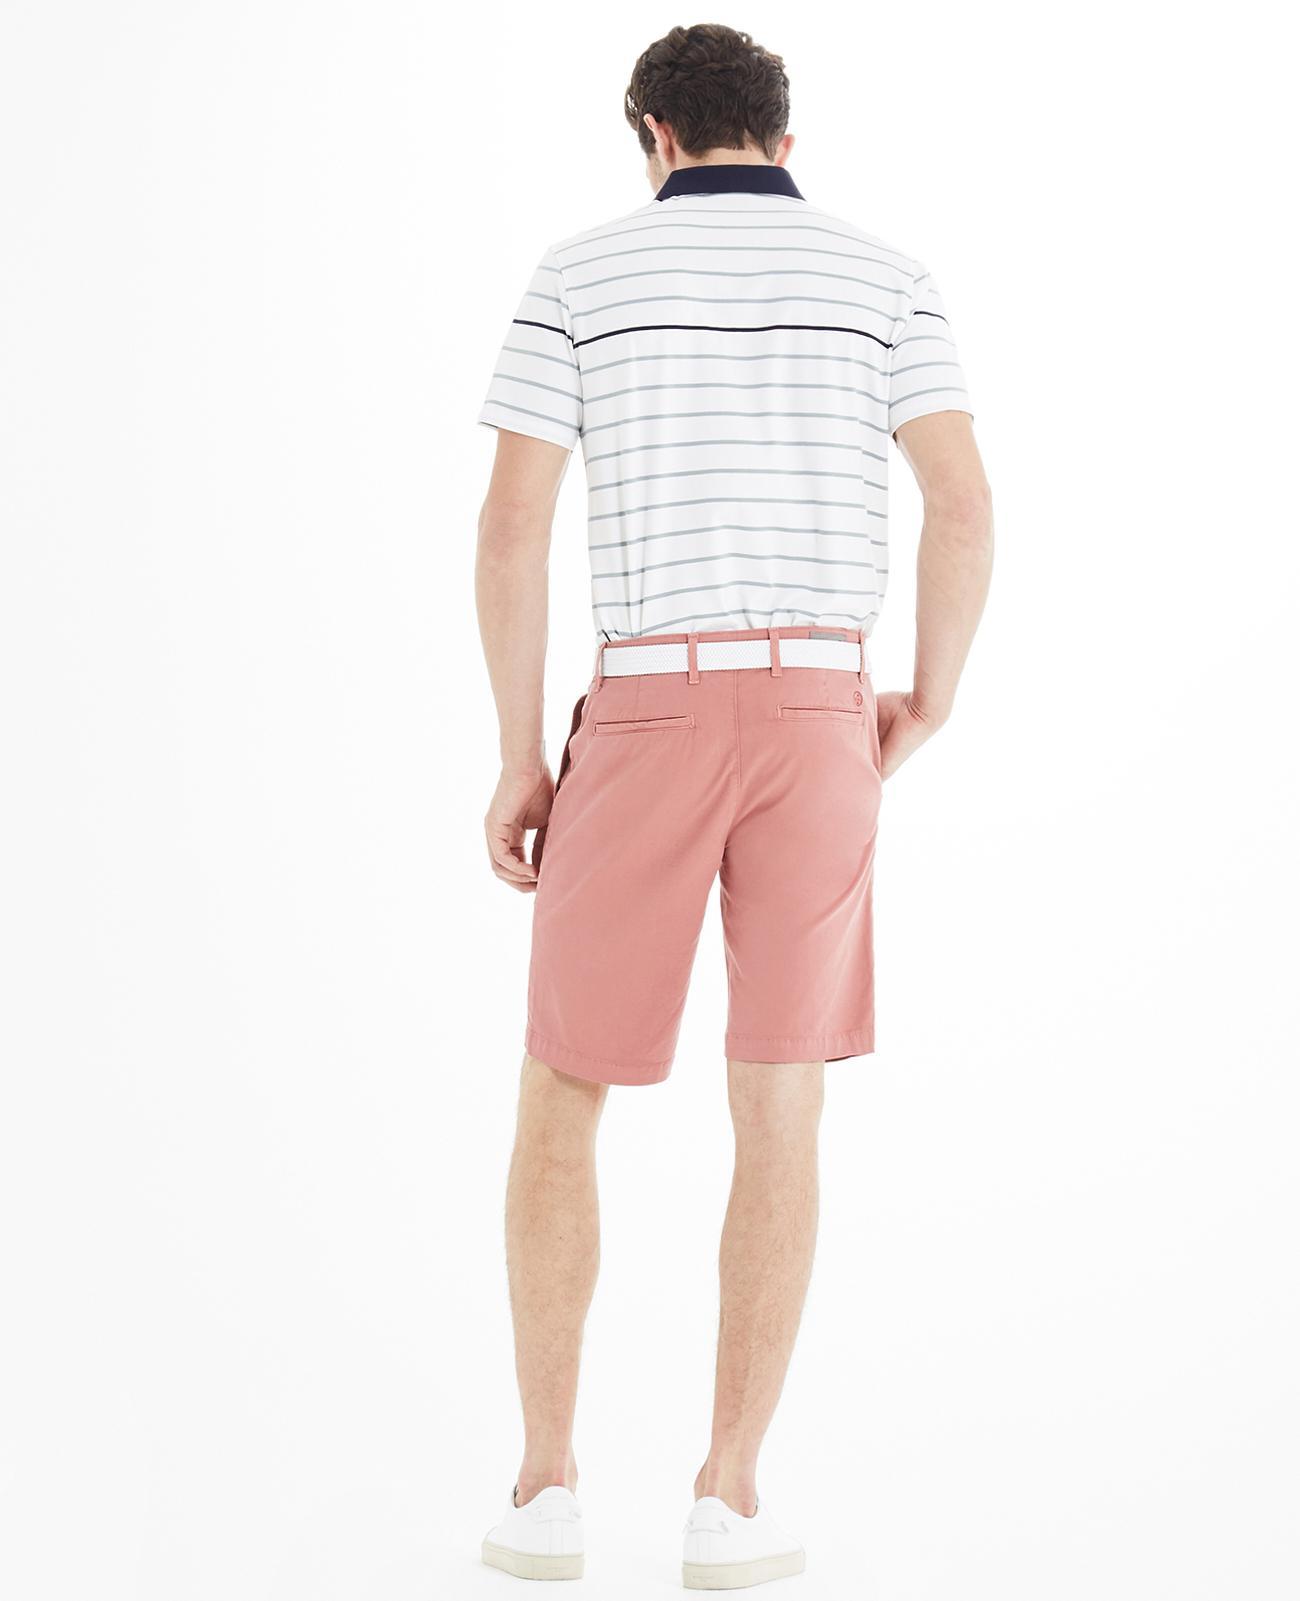 The Farrell Stripe Polo